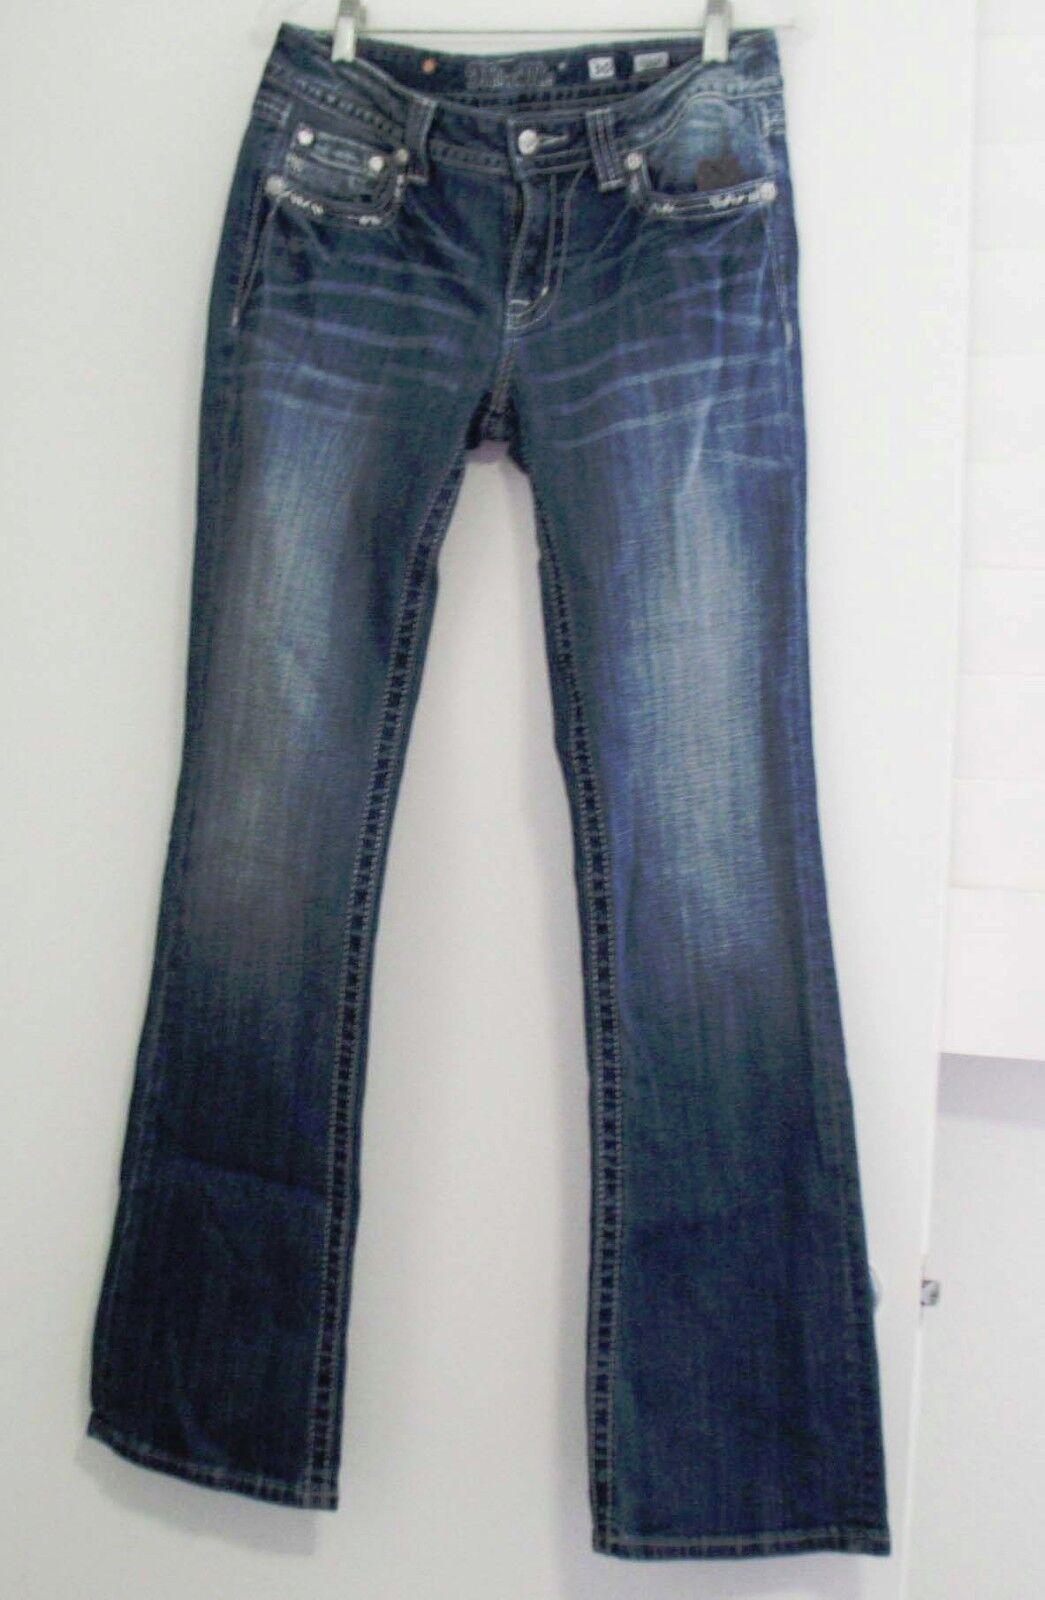 Miss Me Womens Fleur de Lis Bootcut Jeans JP7021B2 Sz 27 - NWT